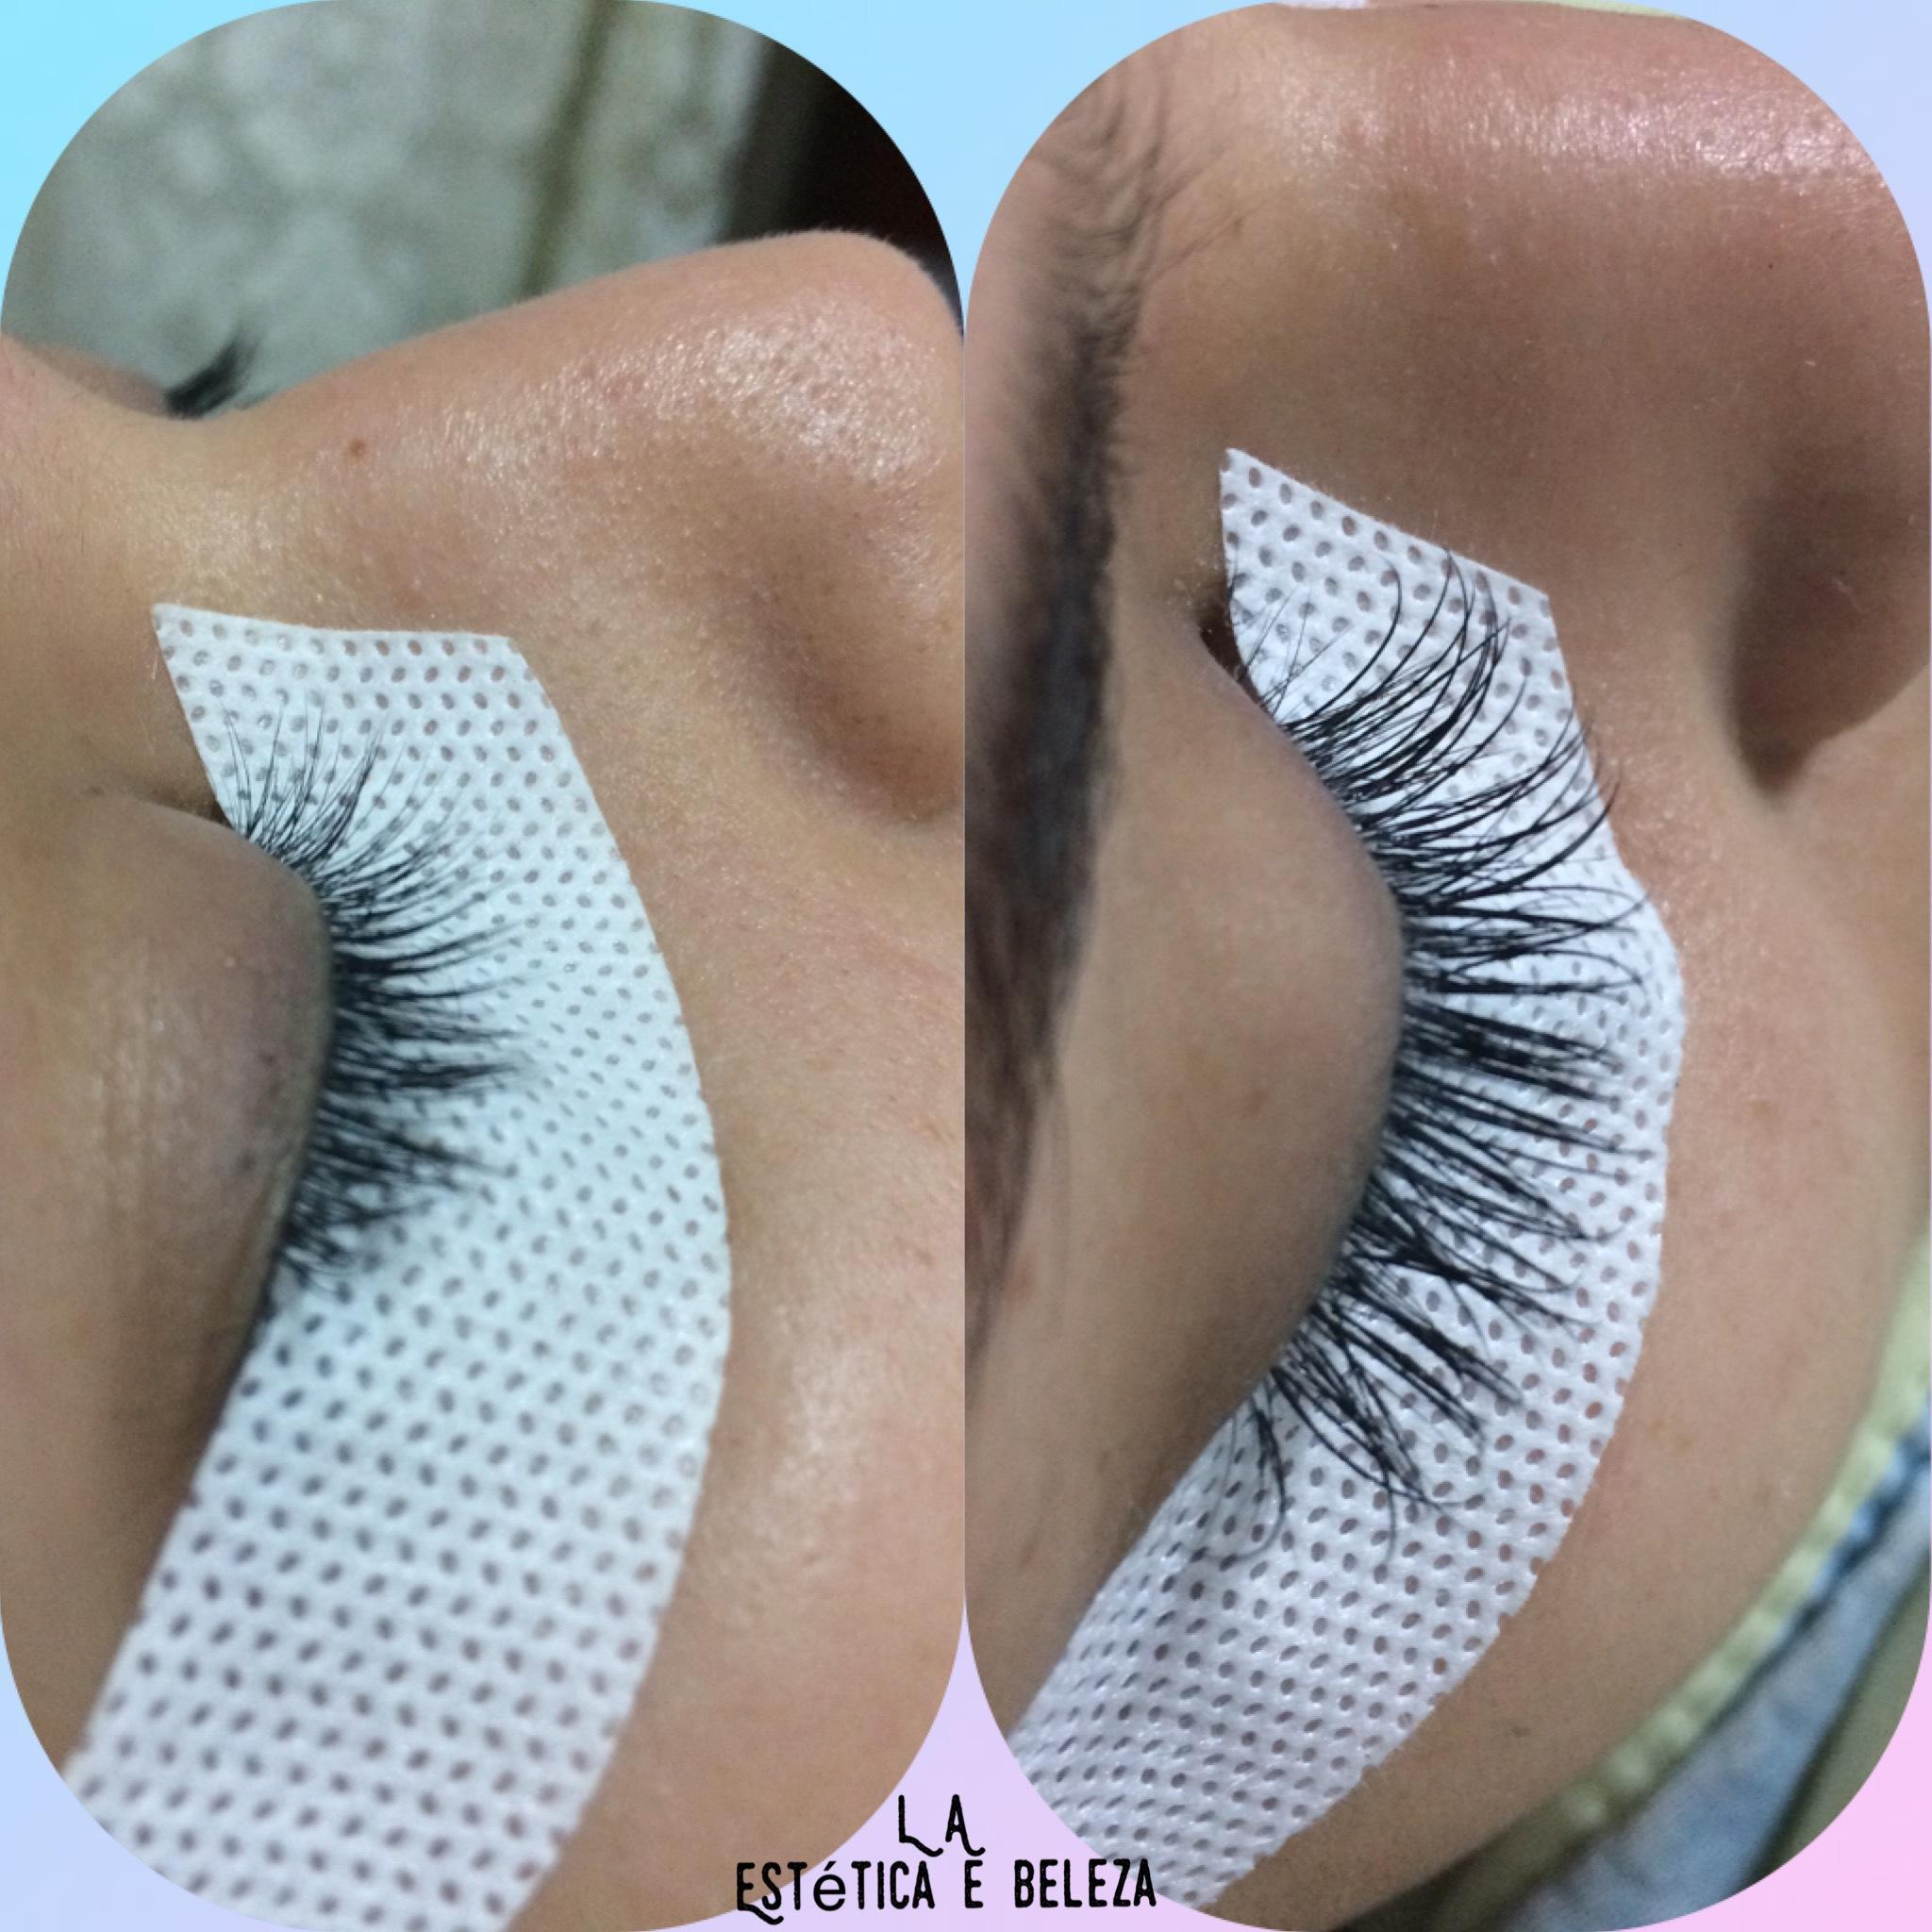 Alongamento de Cílios fio a fio  Embelezamento do Olhar ! estética esteticista maquiador(a) designer de sobrancelhas manicure e pedicure